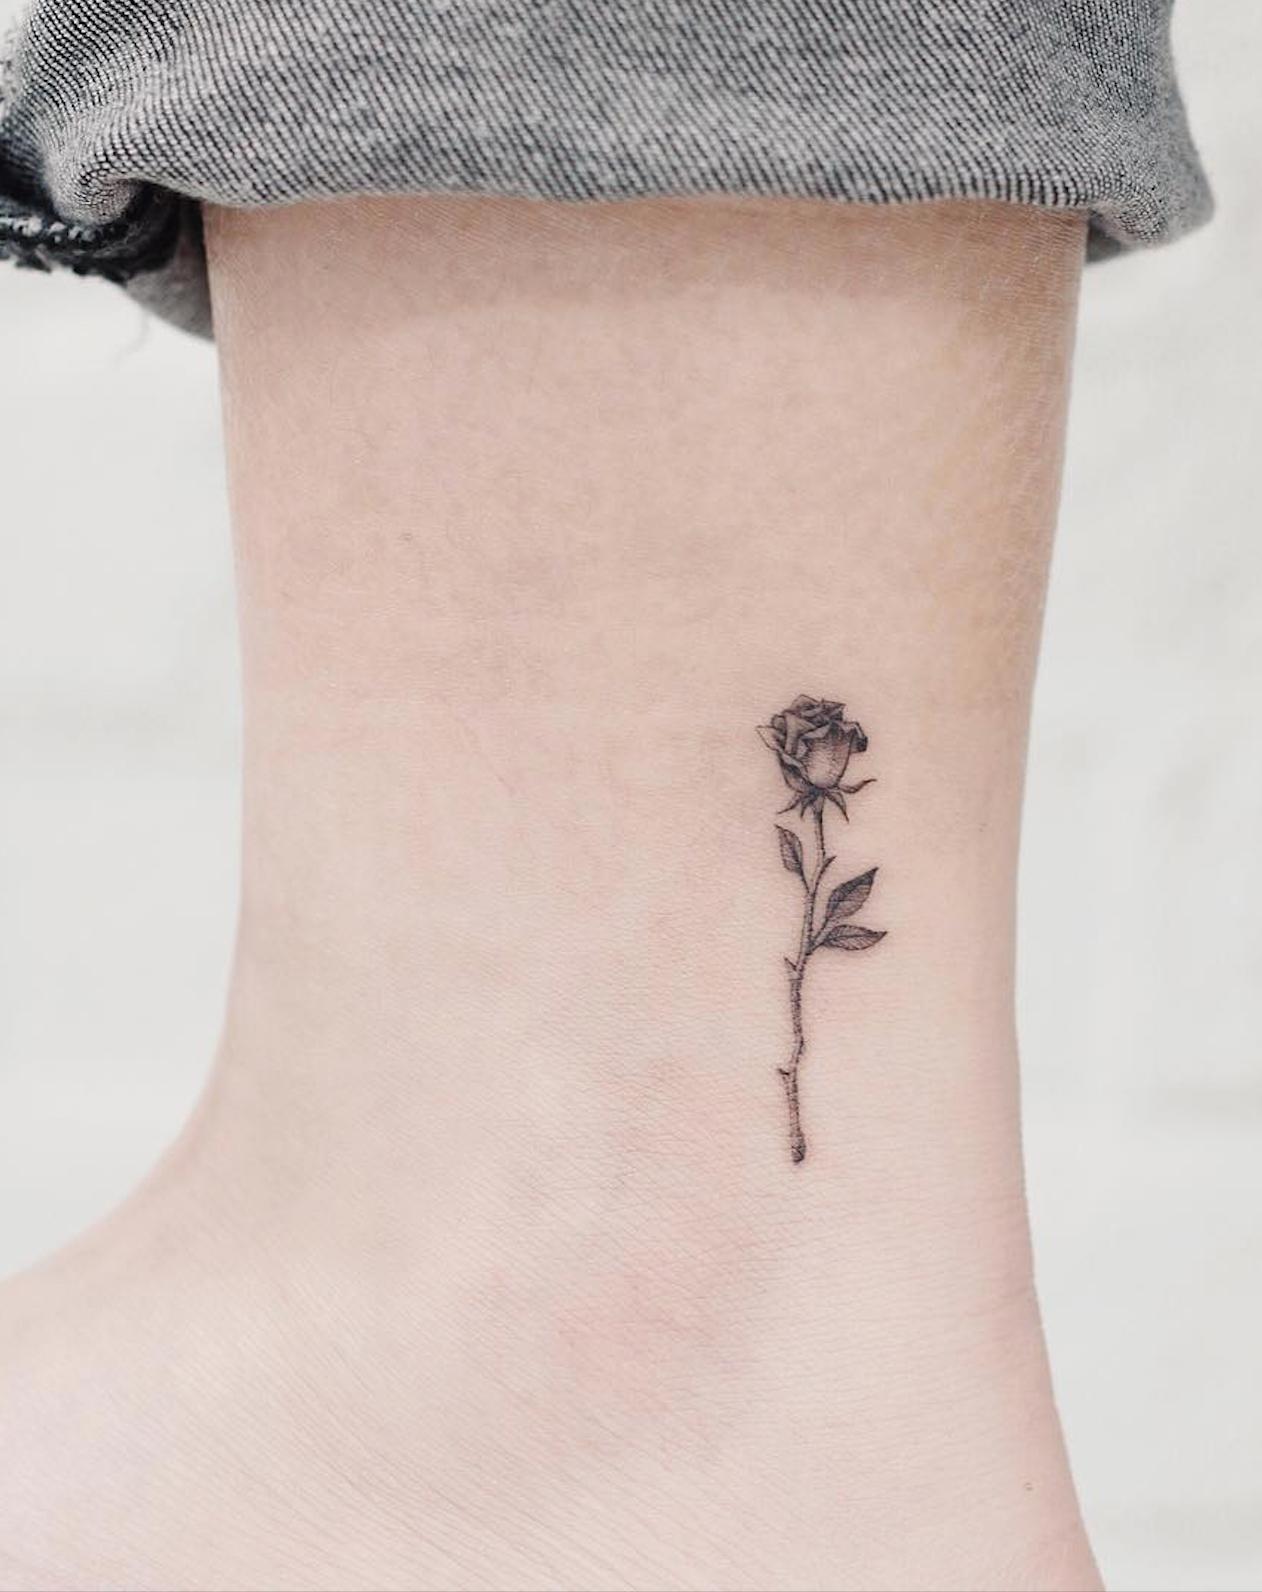 Celebrate The Beauty Of Nature With These Inspirational Sunflower Tattoos Tatuagem Tatuagens Aleatorias Tatuagens Femininas Delicadas